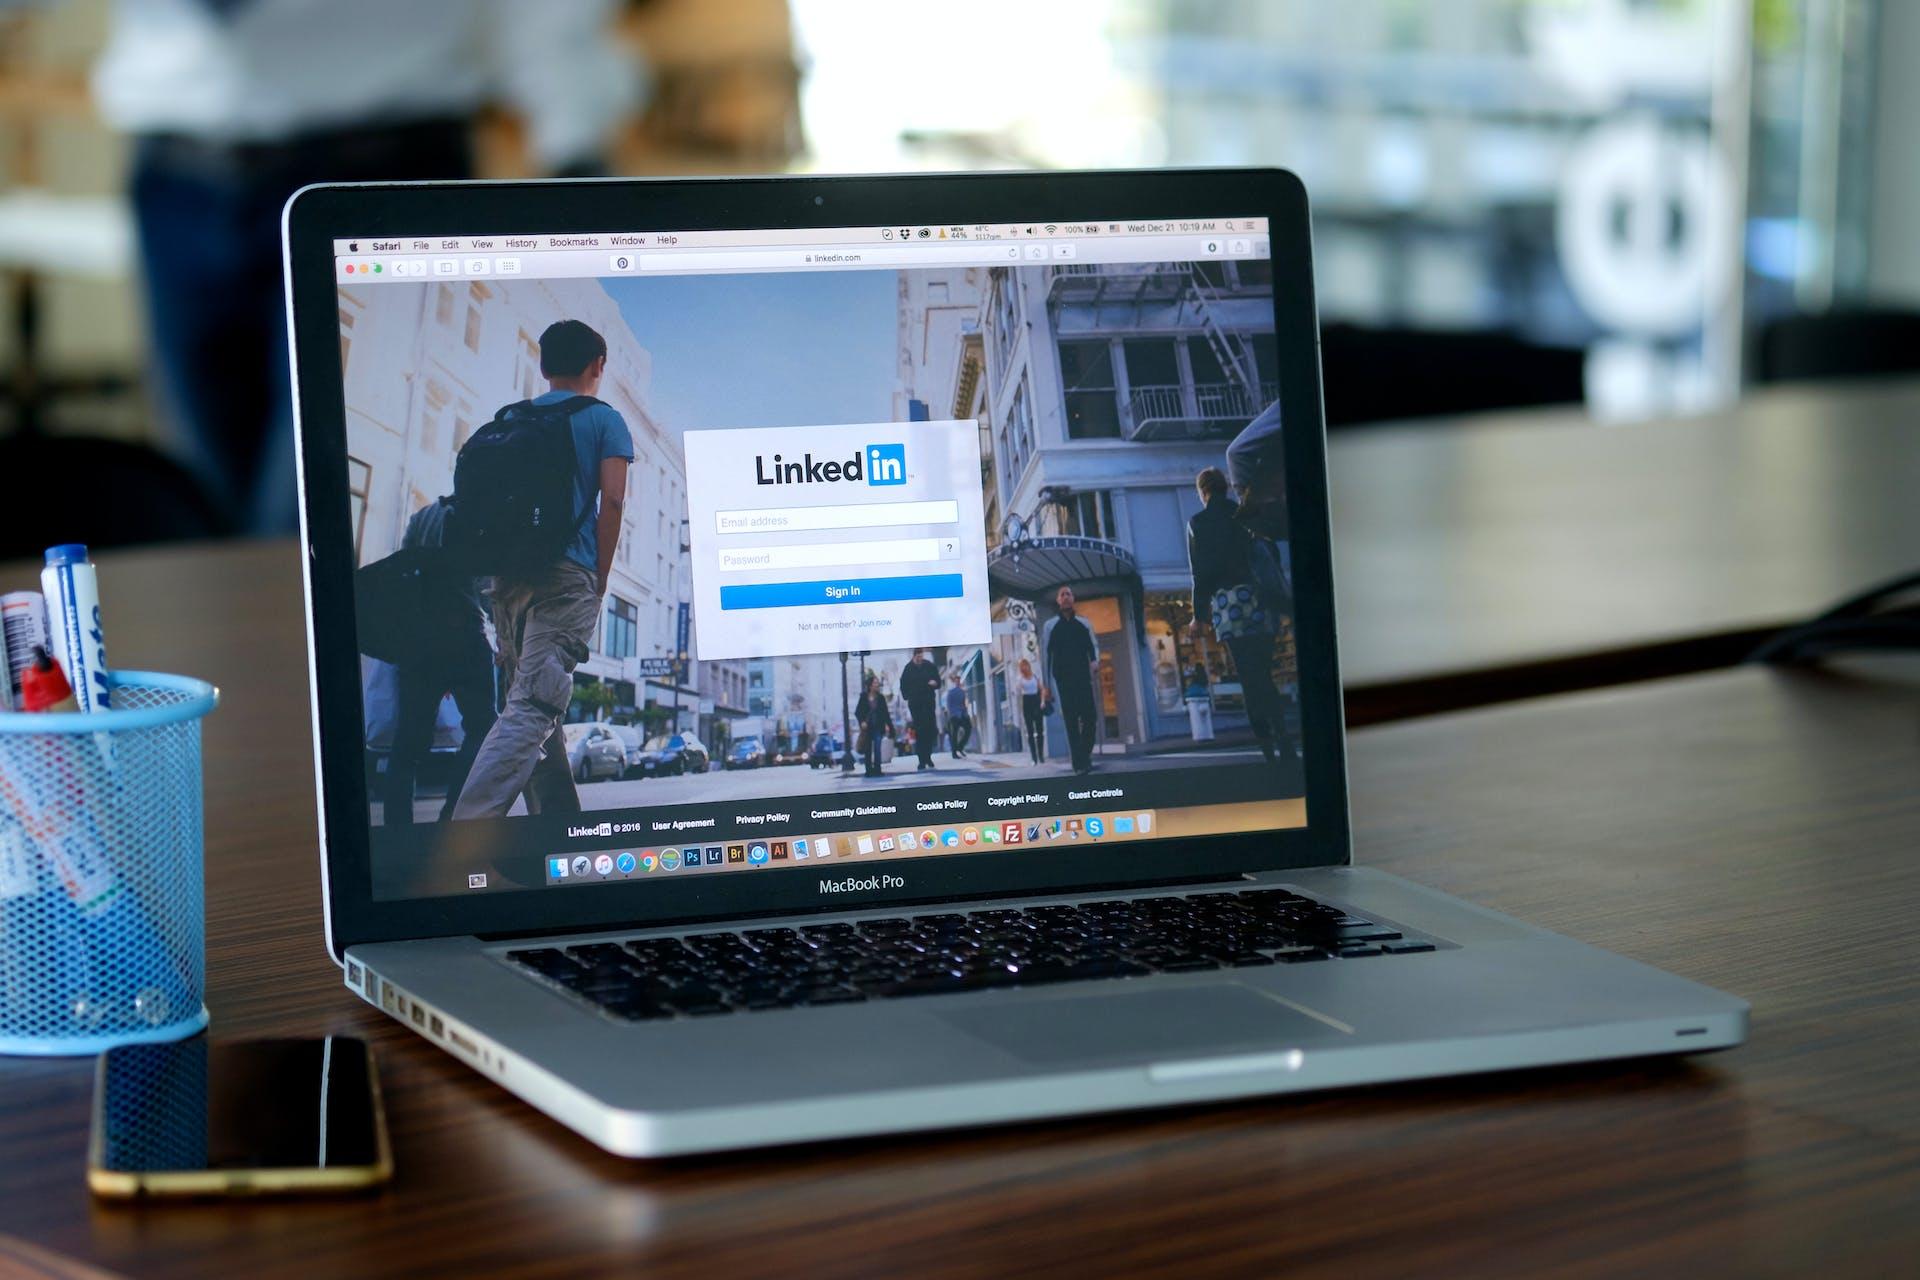 LinkedIn influence